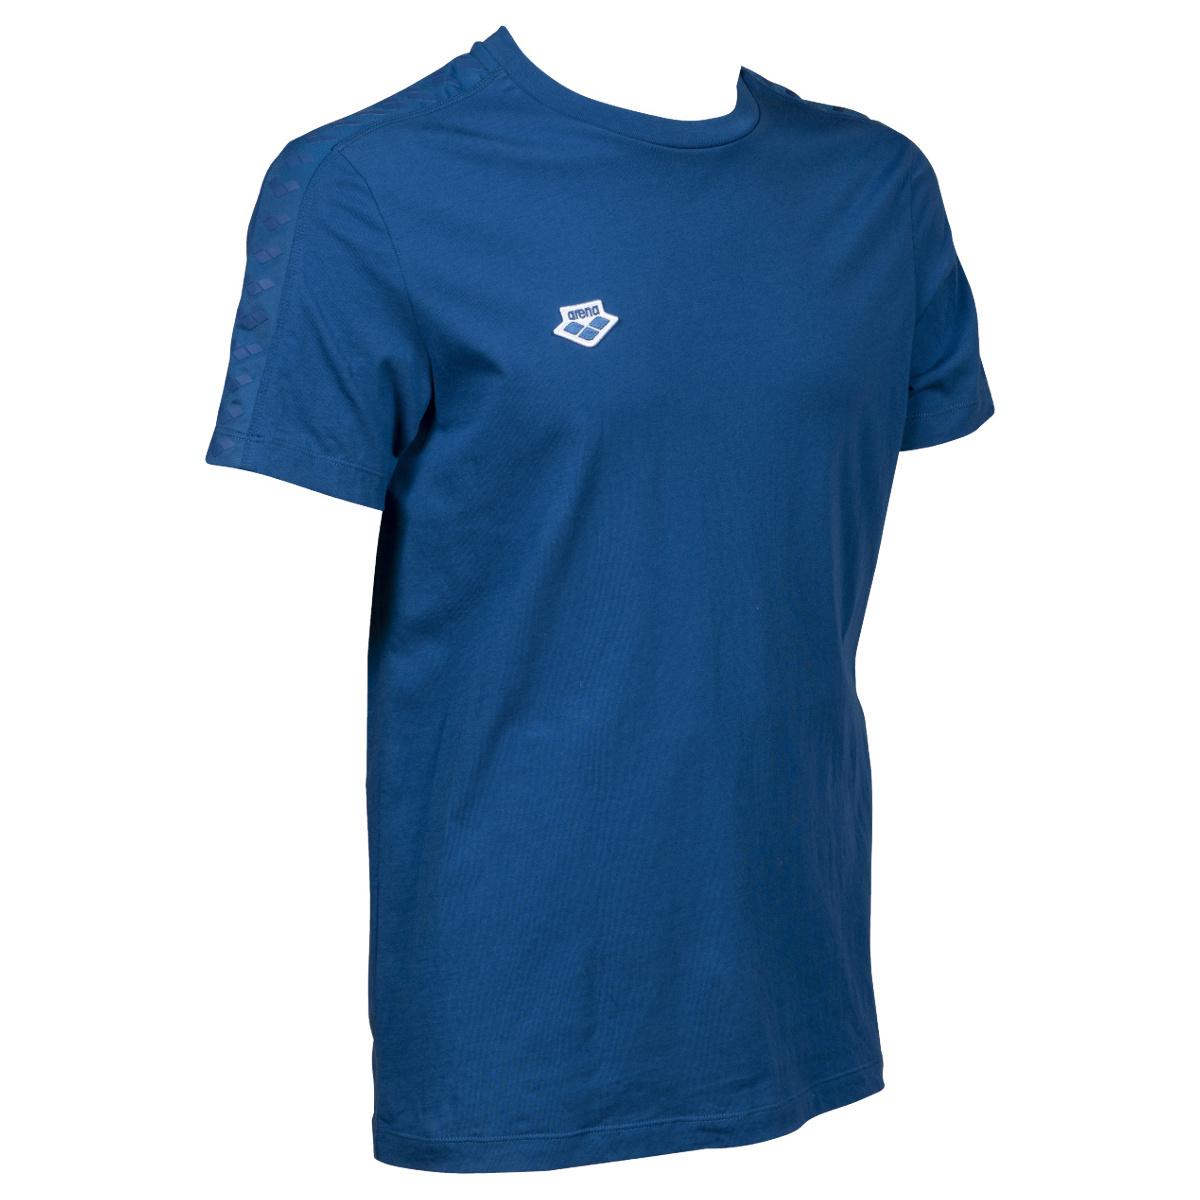 arena Team T-Shirt - triple denim